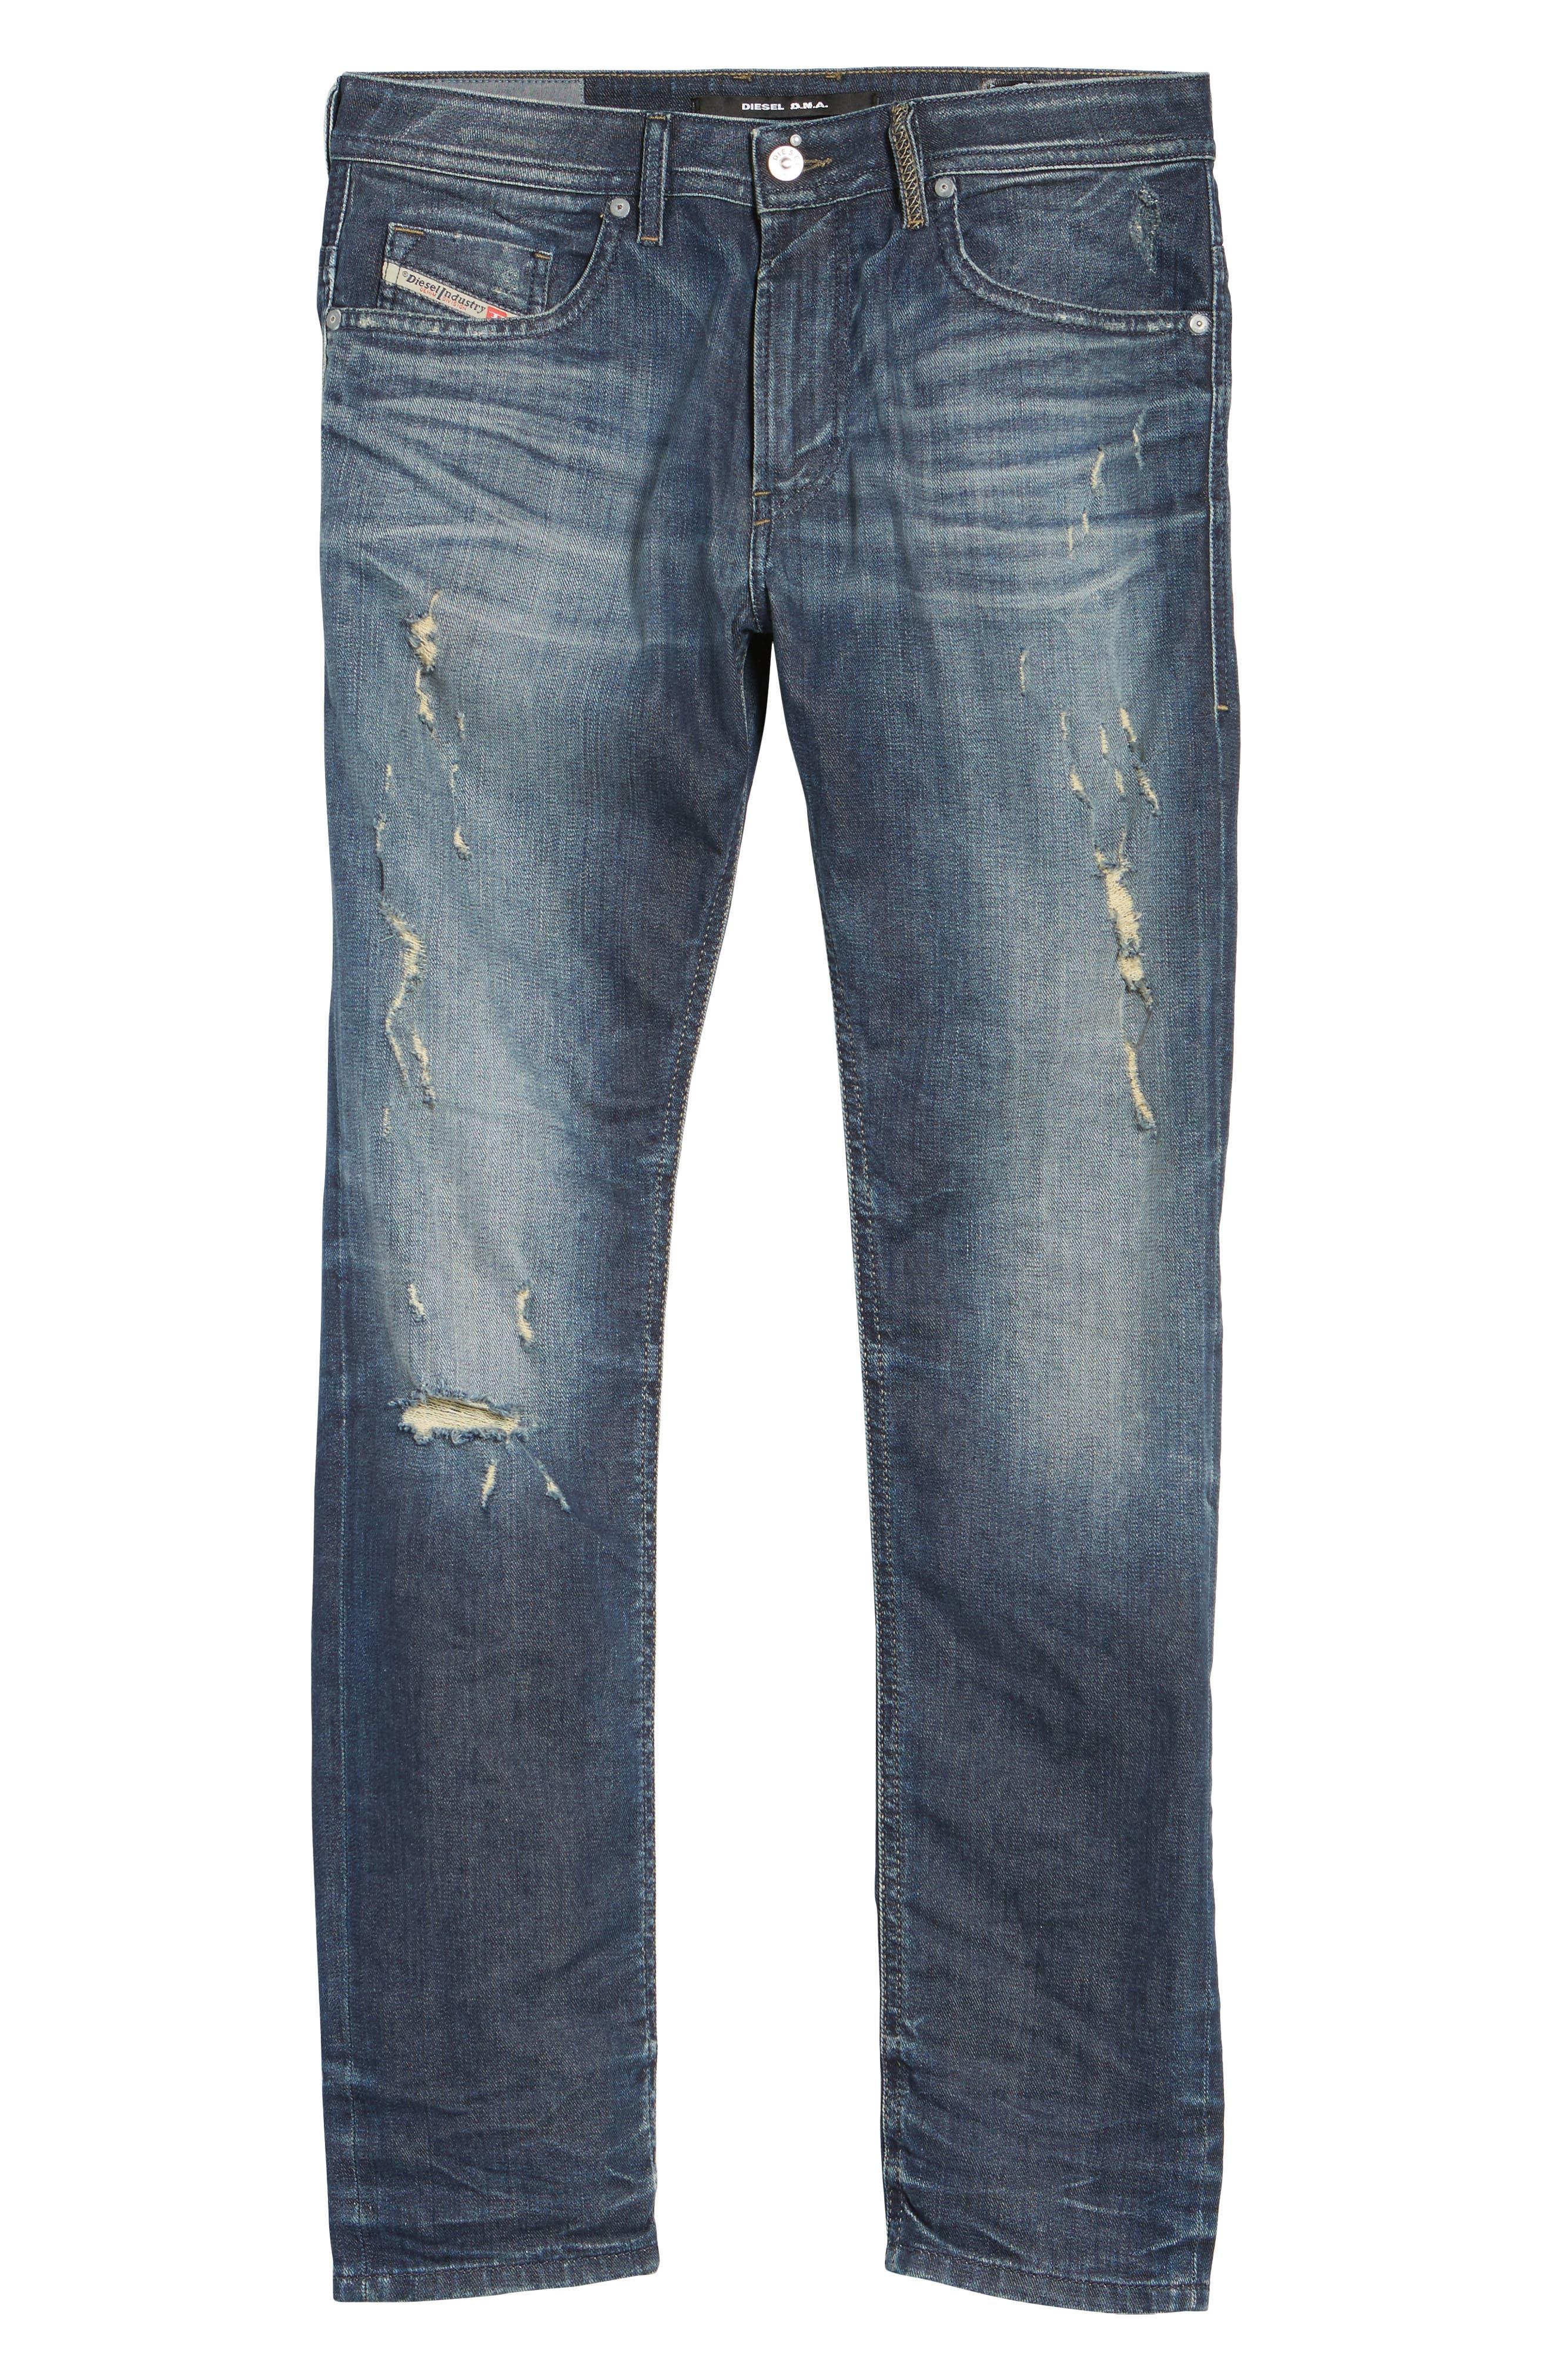 Thommer Slim Fit Jeans,                             Alternate thumbnail 6, color,